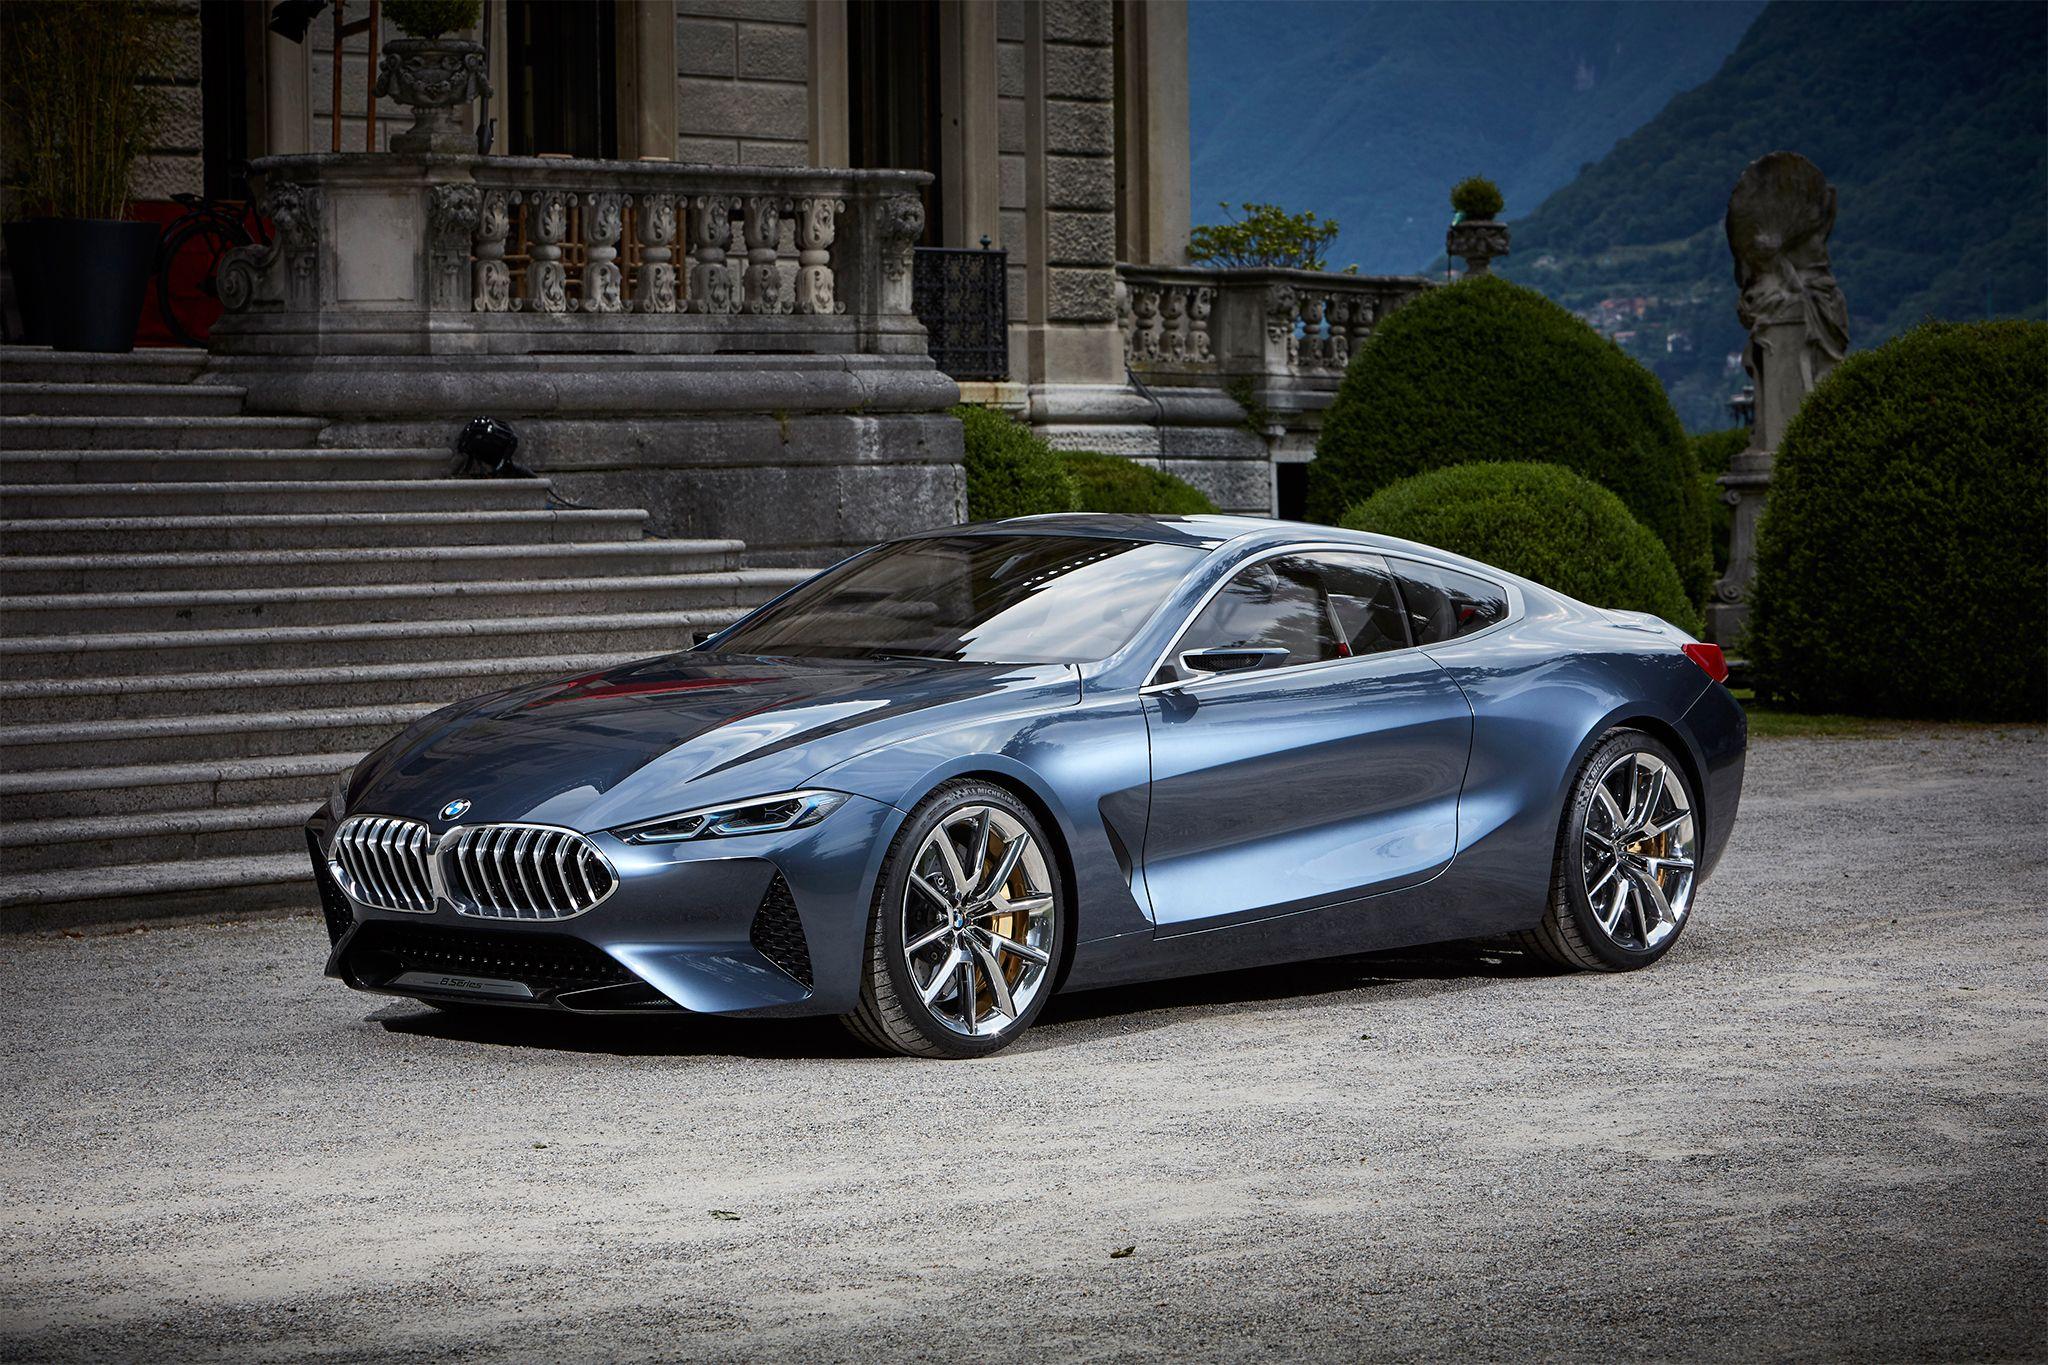 Exclusive Bmw 8 Series Concept Quick Drive Bmw Luxury Hybrid